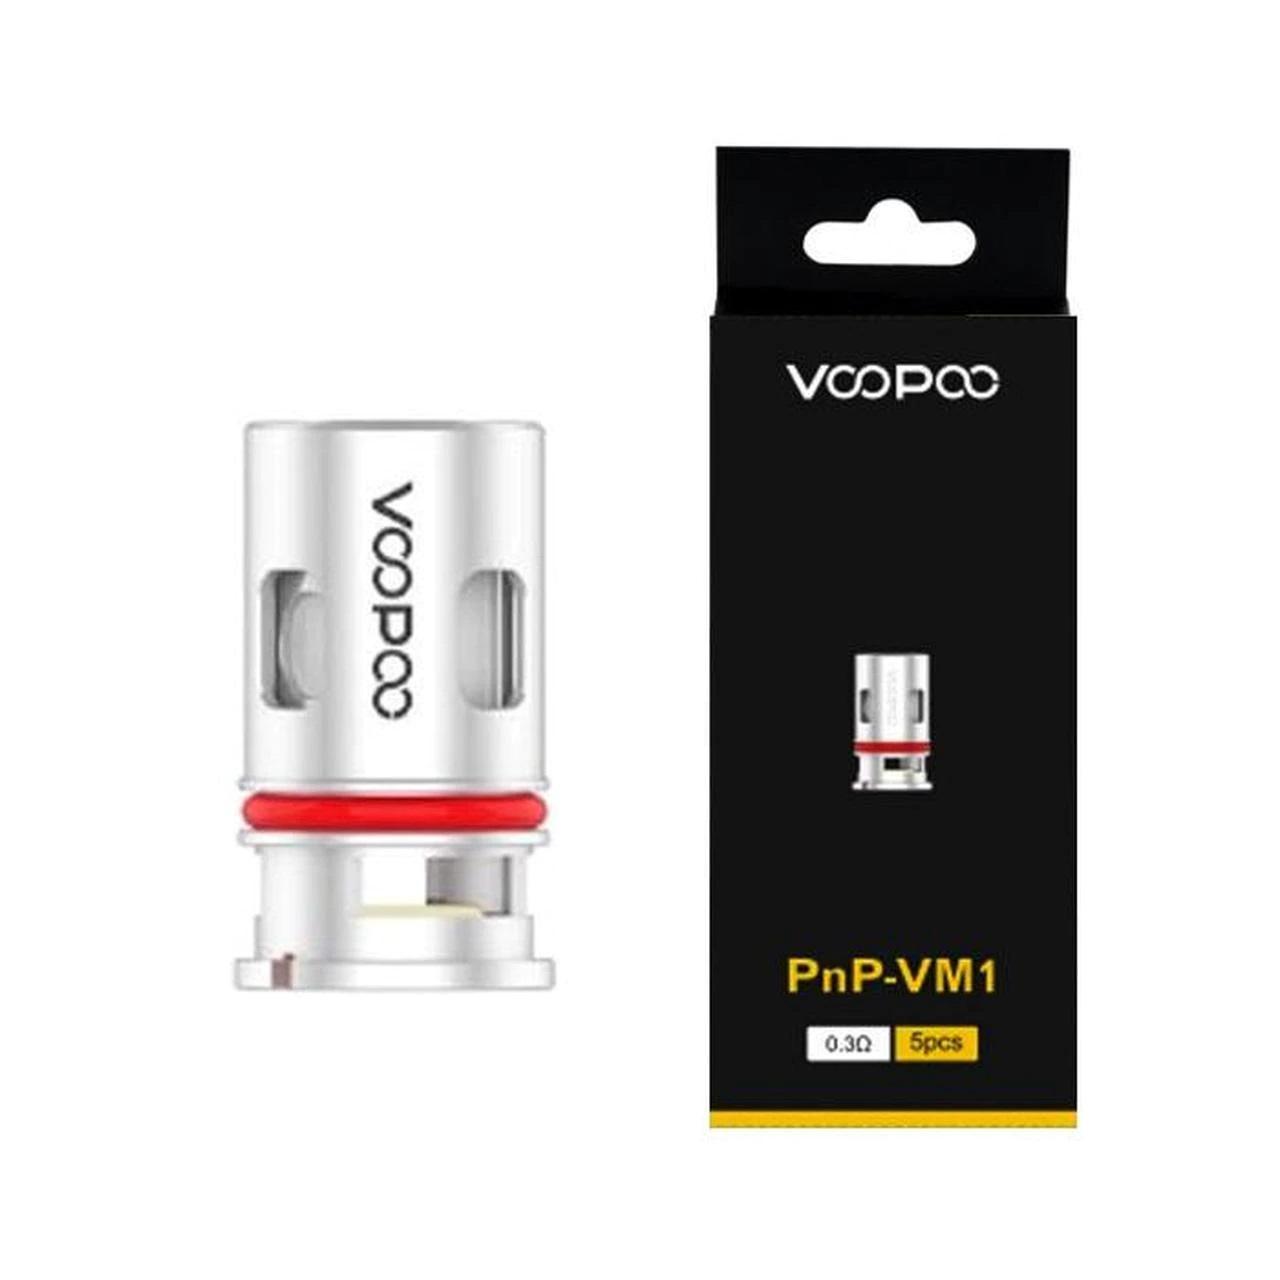 'VOOPOO VINCI COIL 0.3'